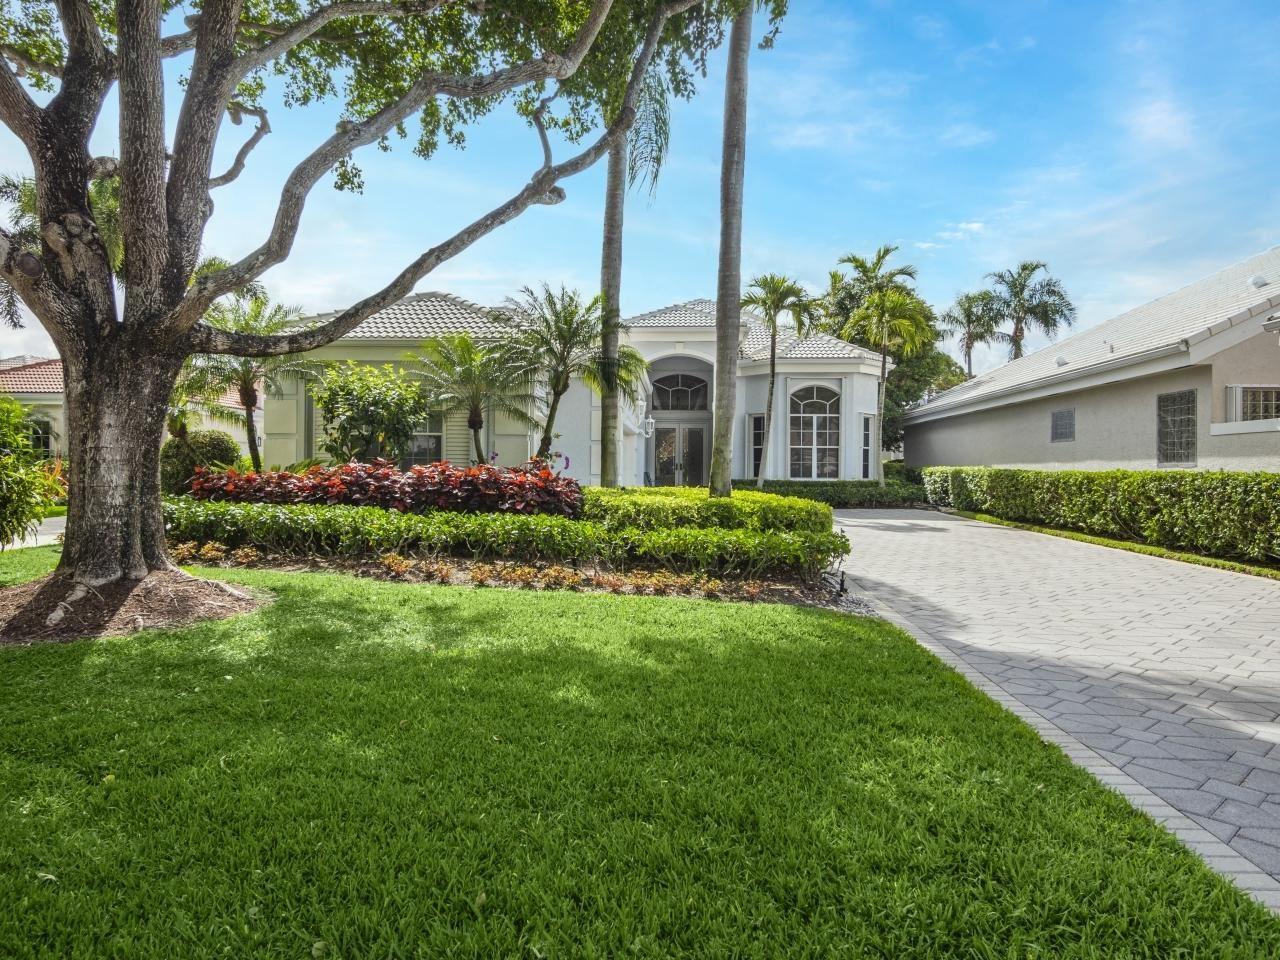 Photo of 148 Windward Drive, Palm Beach Gardens, FL 33418 (MLS # RX-10711723)